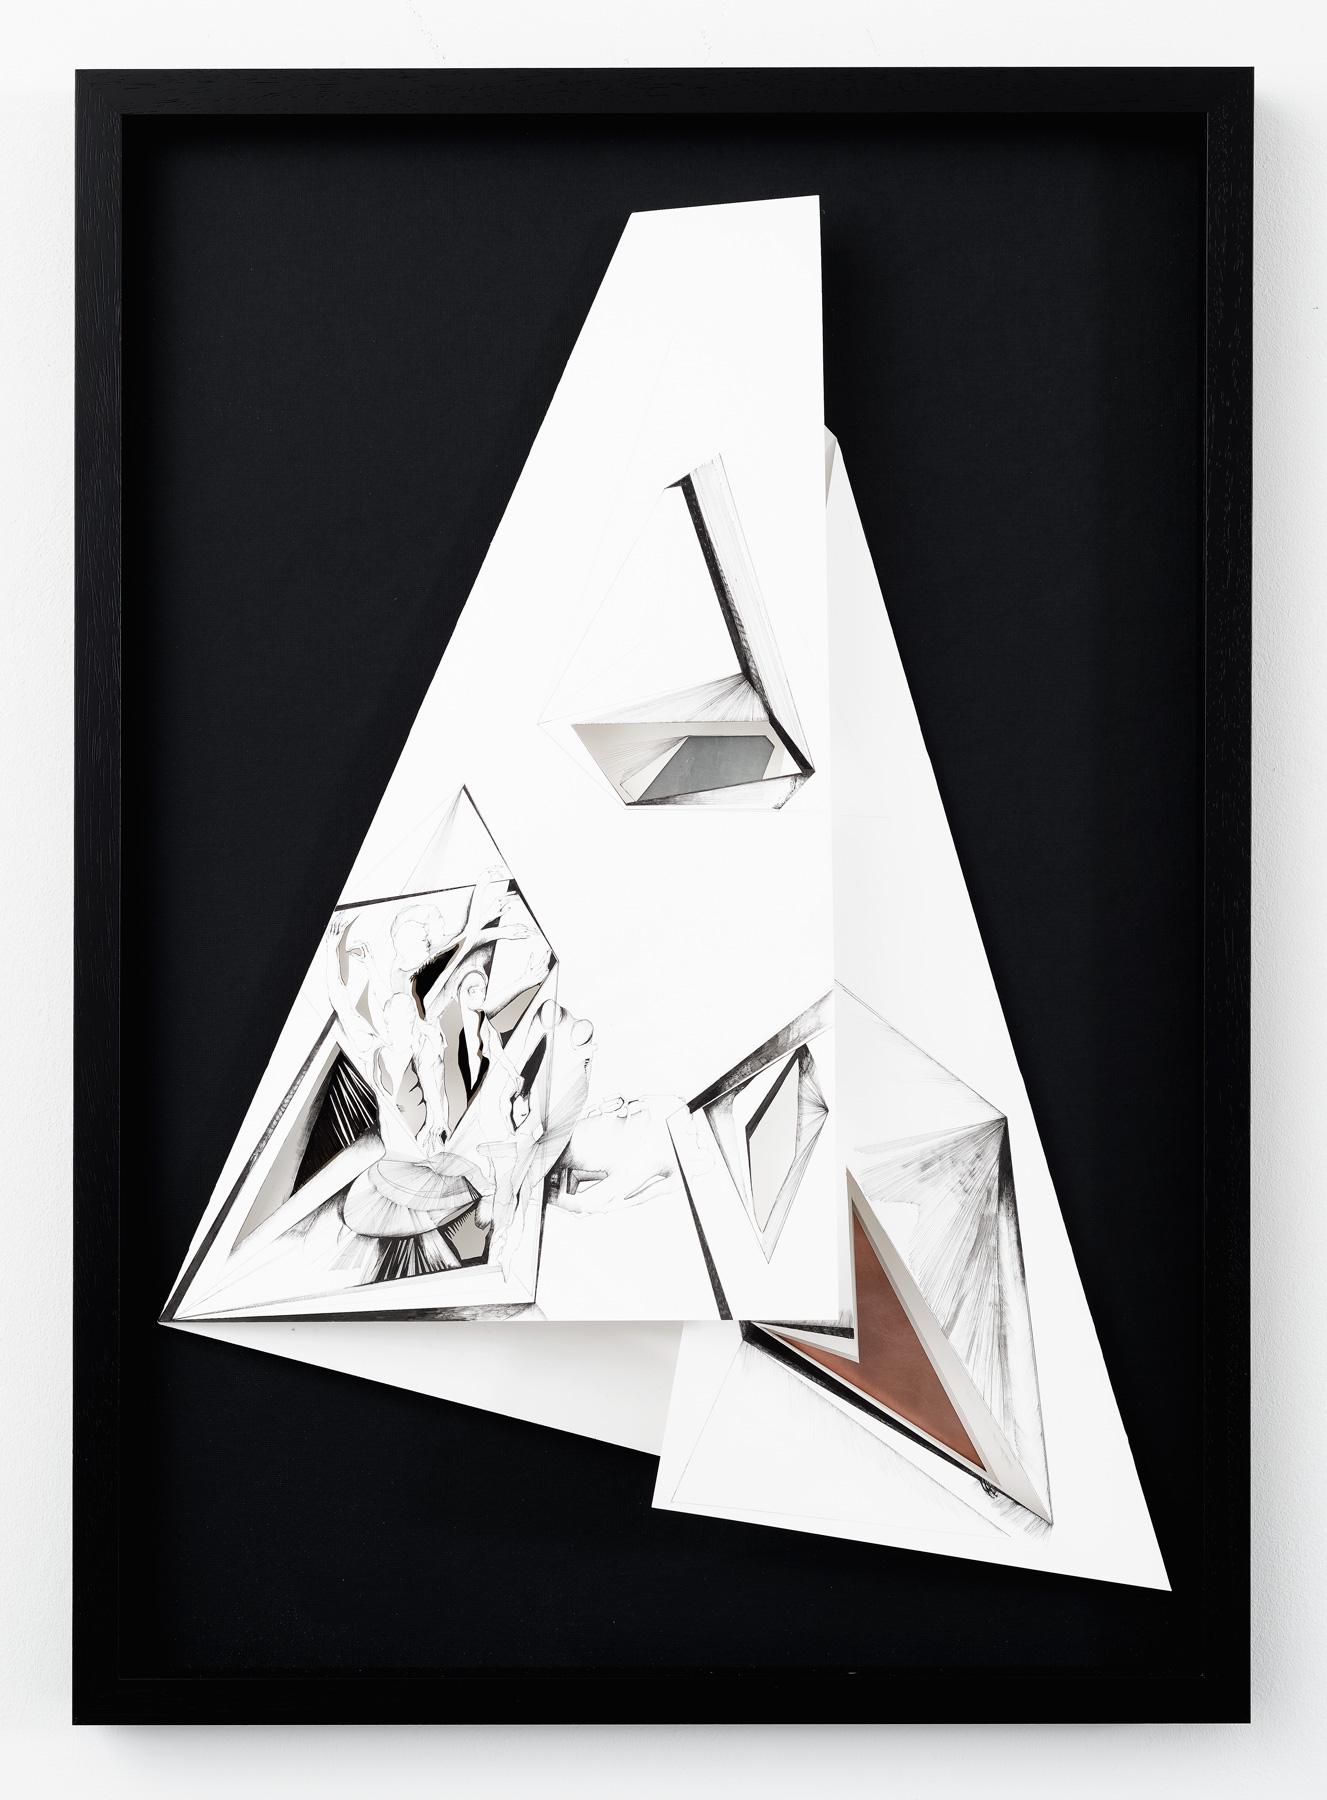 Nina Annabelle Märkl | Torsionen 3 | Ink on folded paper, cutouts, brass, copper, polished steel, black cardboard | 105 x 75 x 5 cm | 2016